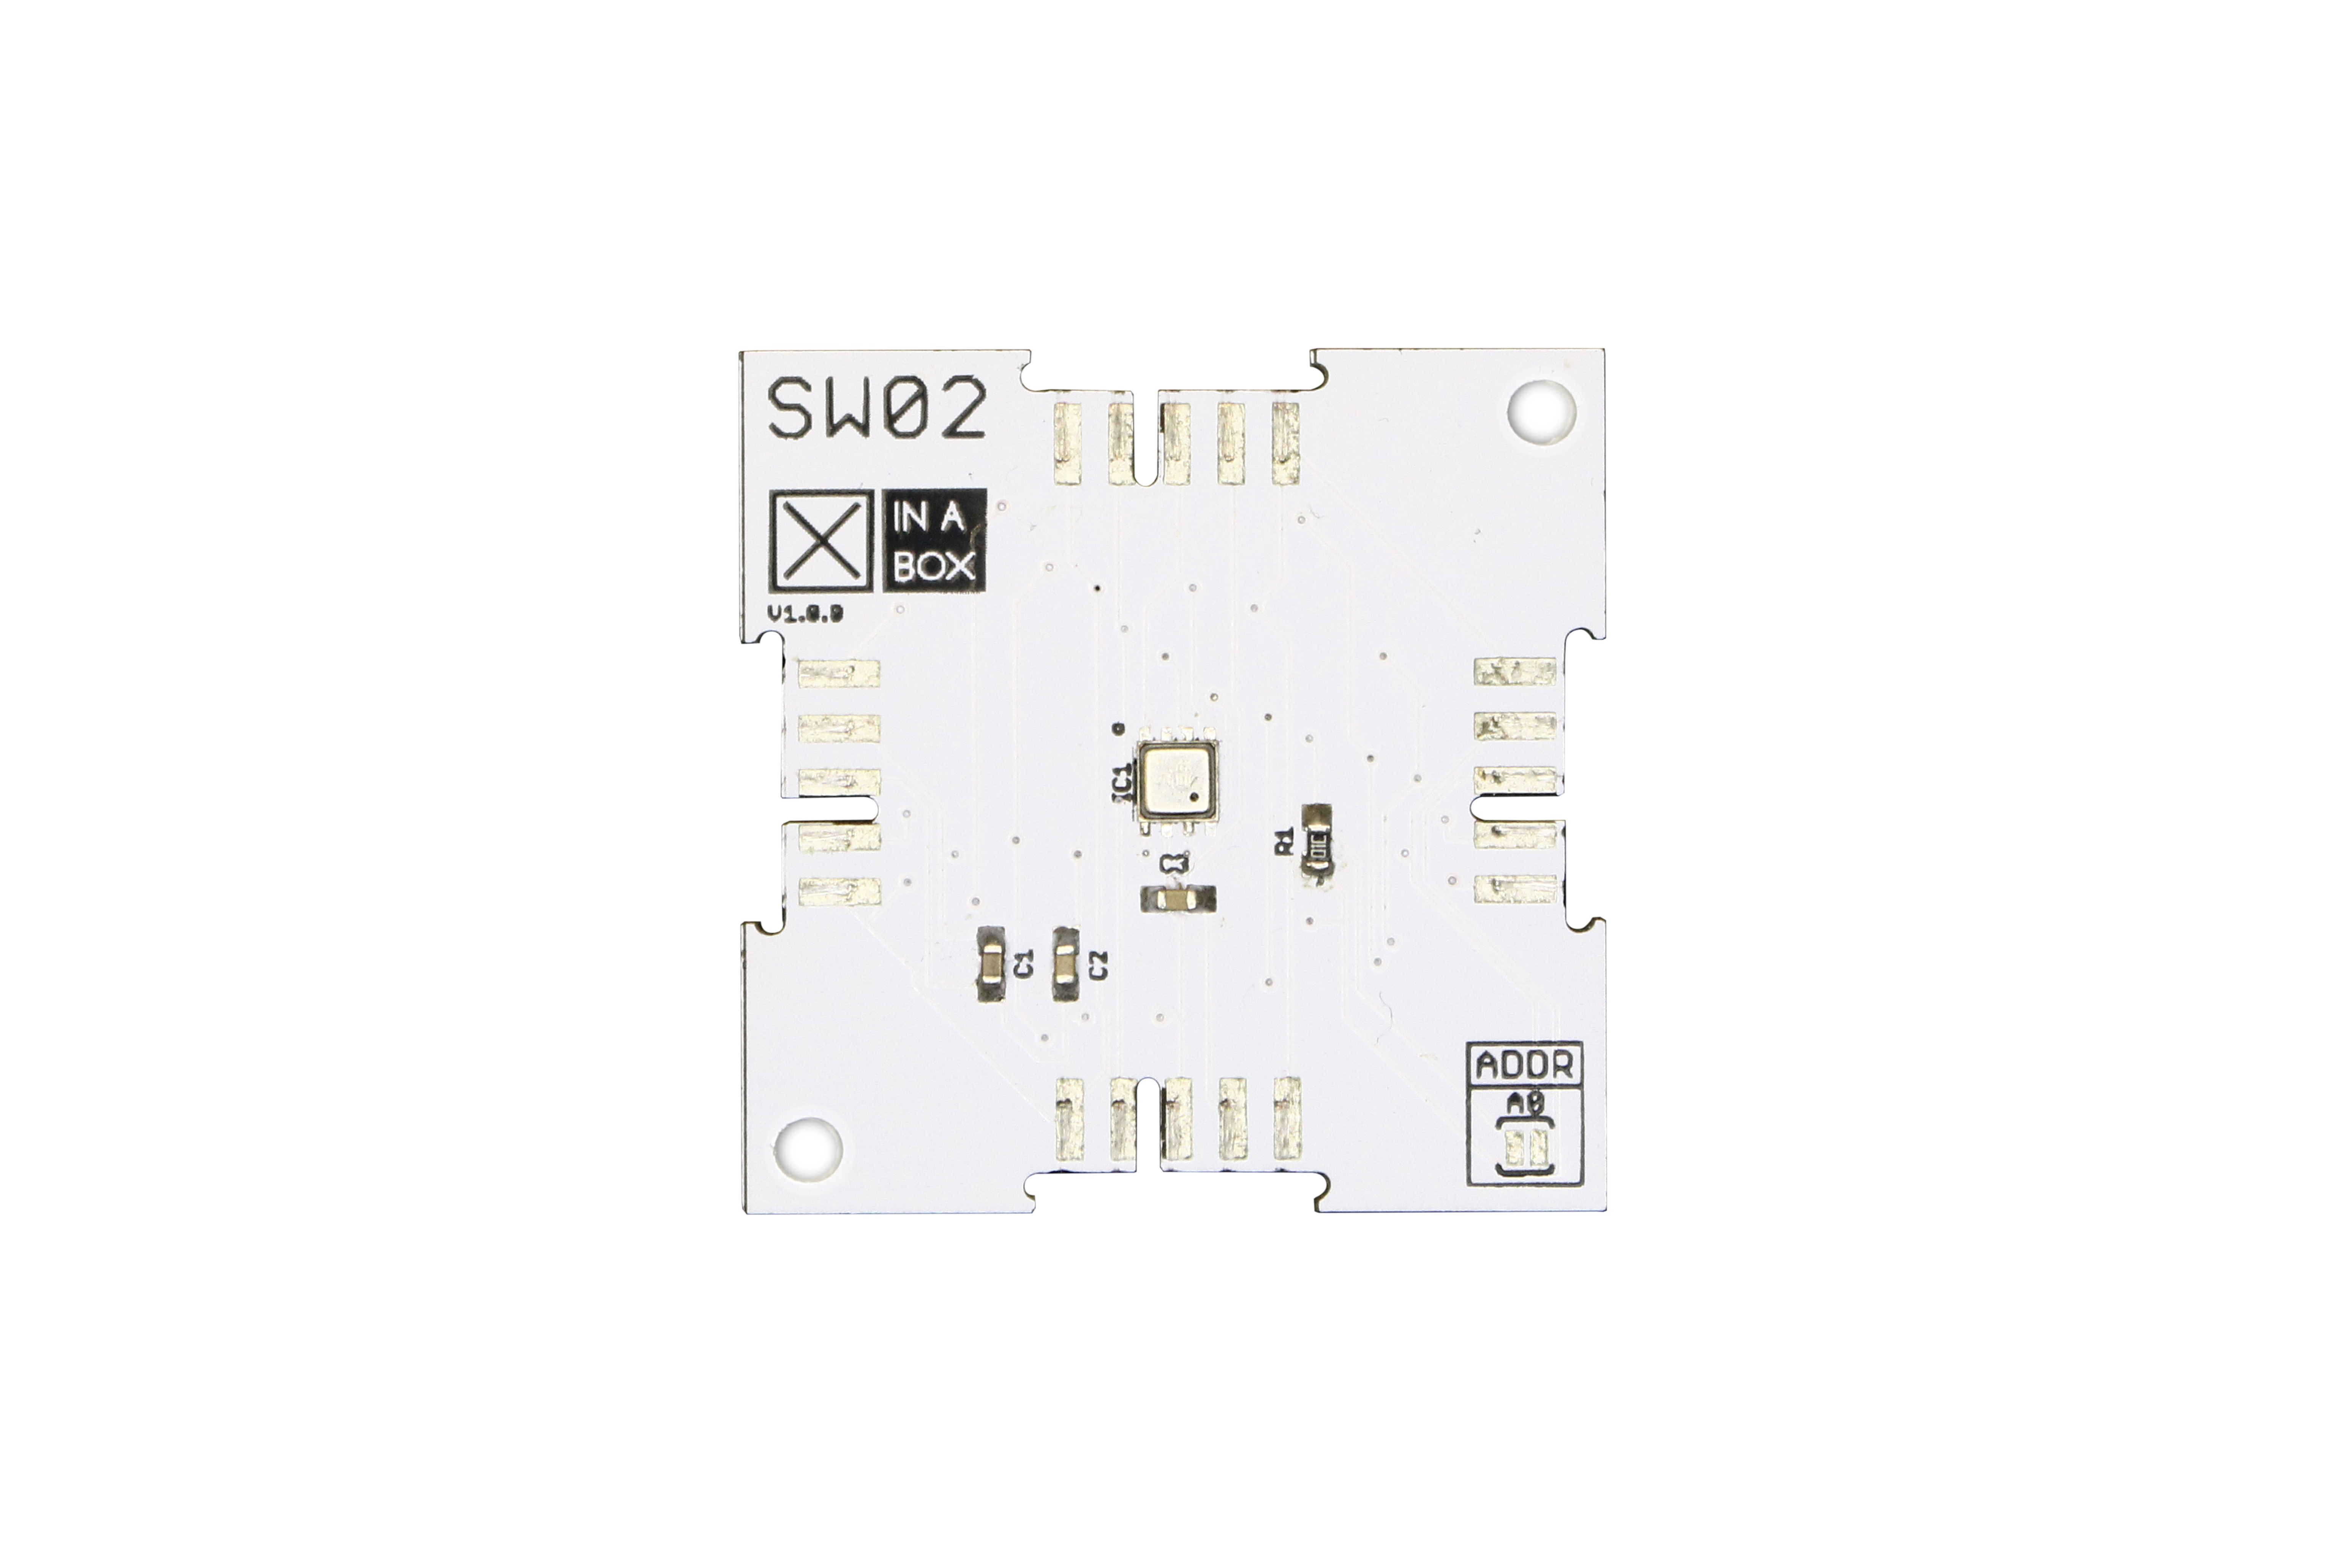 Xinabox Sw02 - Voc And Weather Sensor